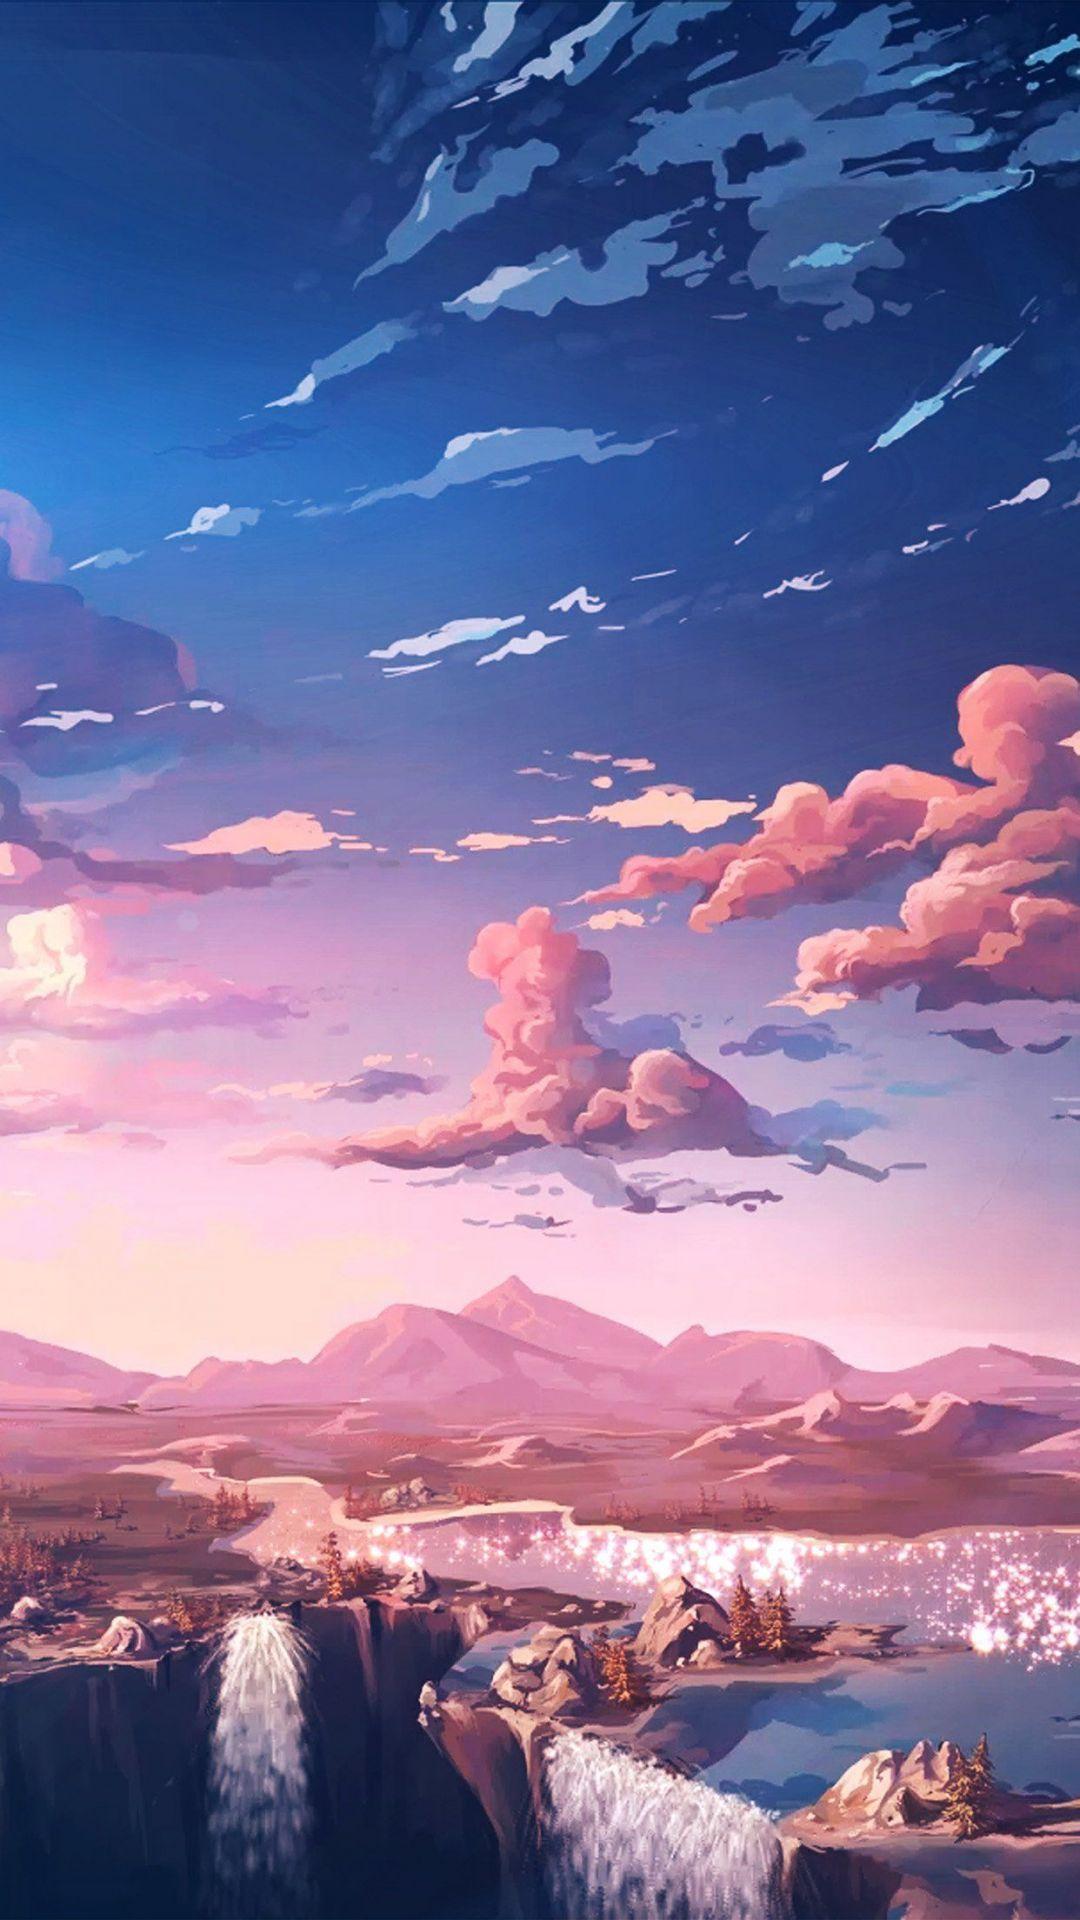 Anime Art Android Iphone Desktop Hd Backgrounds Wallpapers 1080p 4k 103967 Hdwallpap Landscape Wallpaper Scenery Wallpaper Anime Scenery Wallpaper